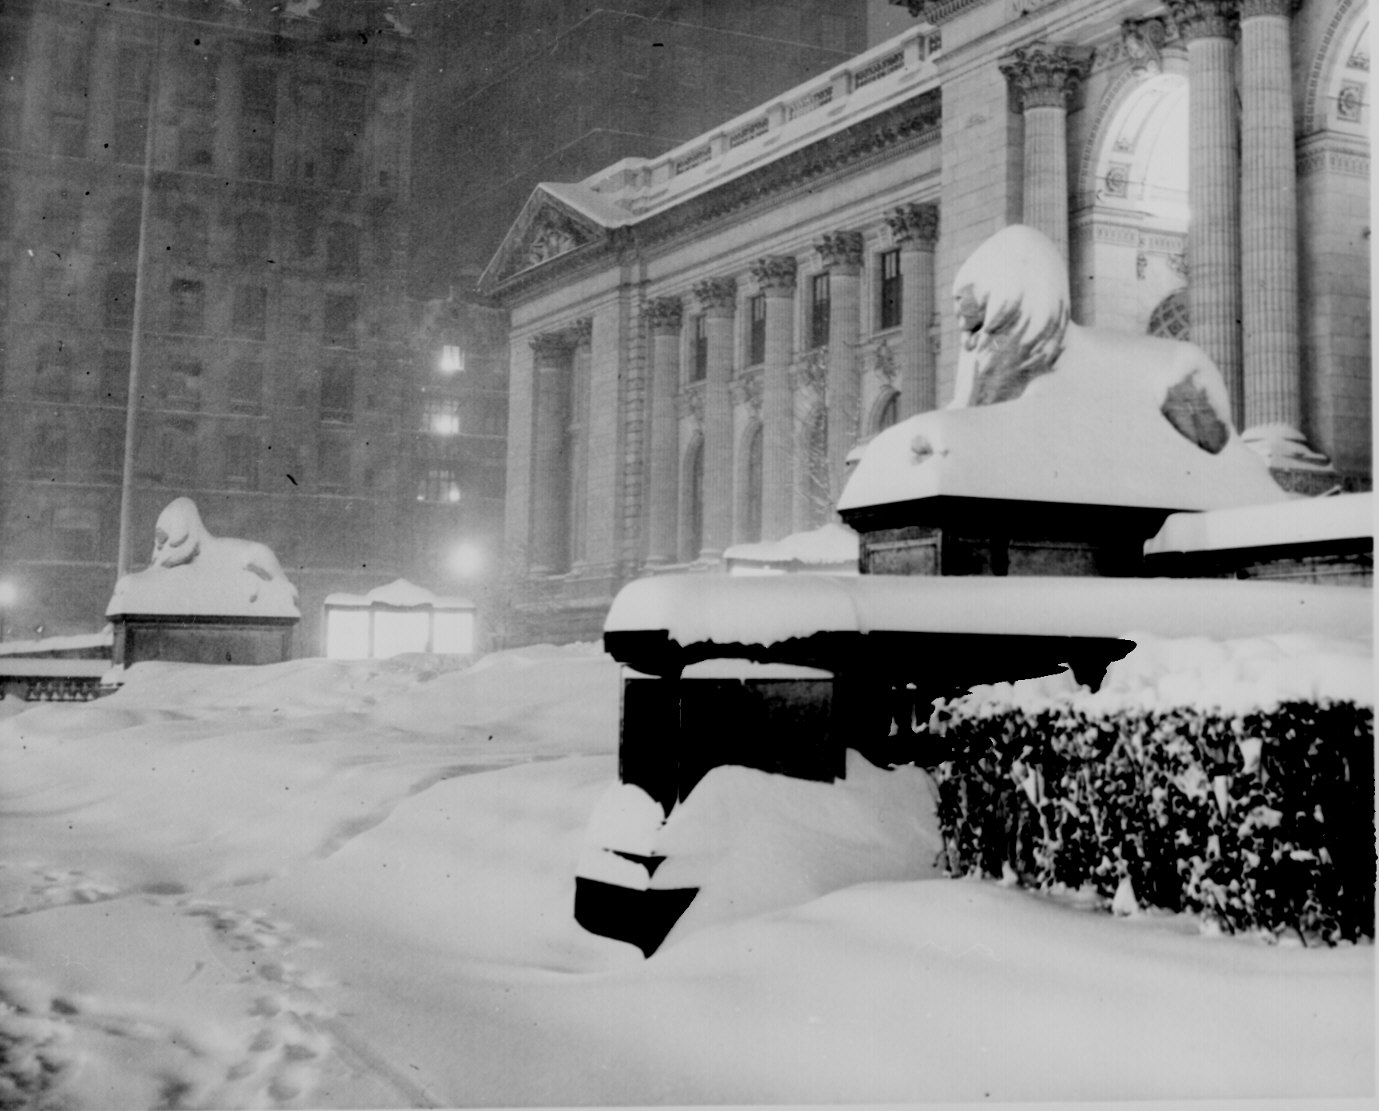 lions-snow